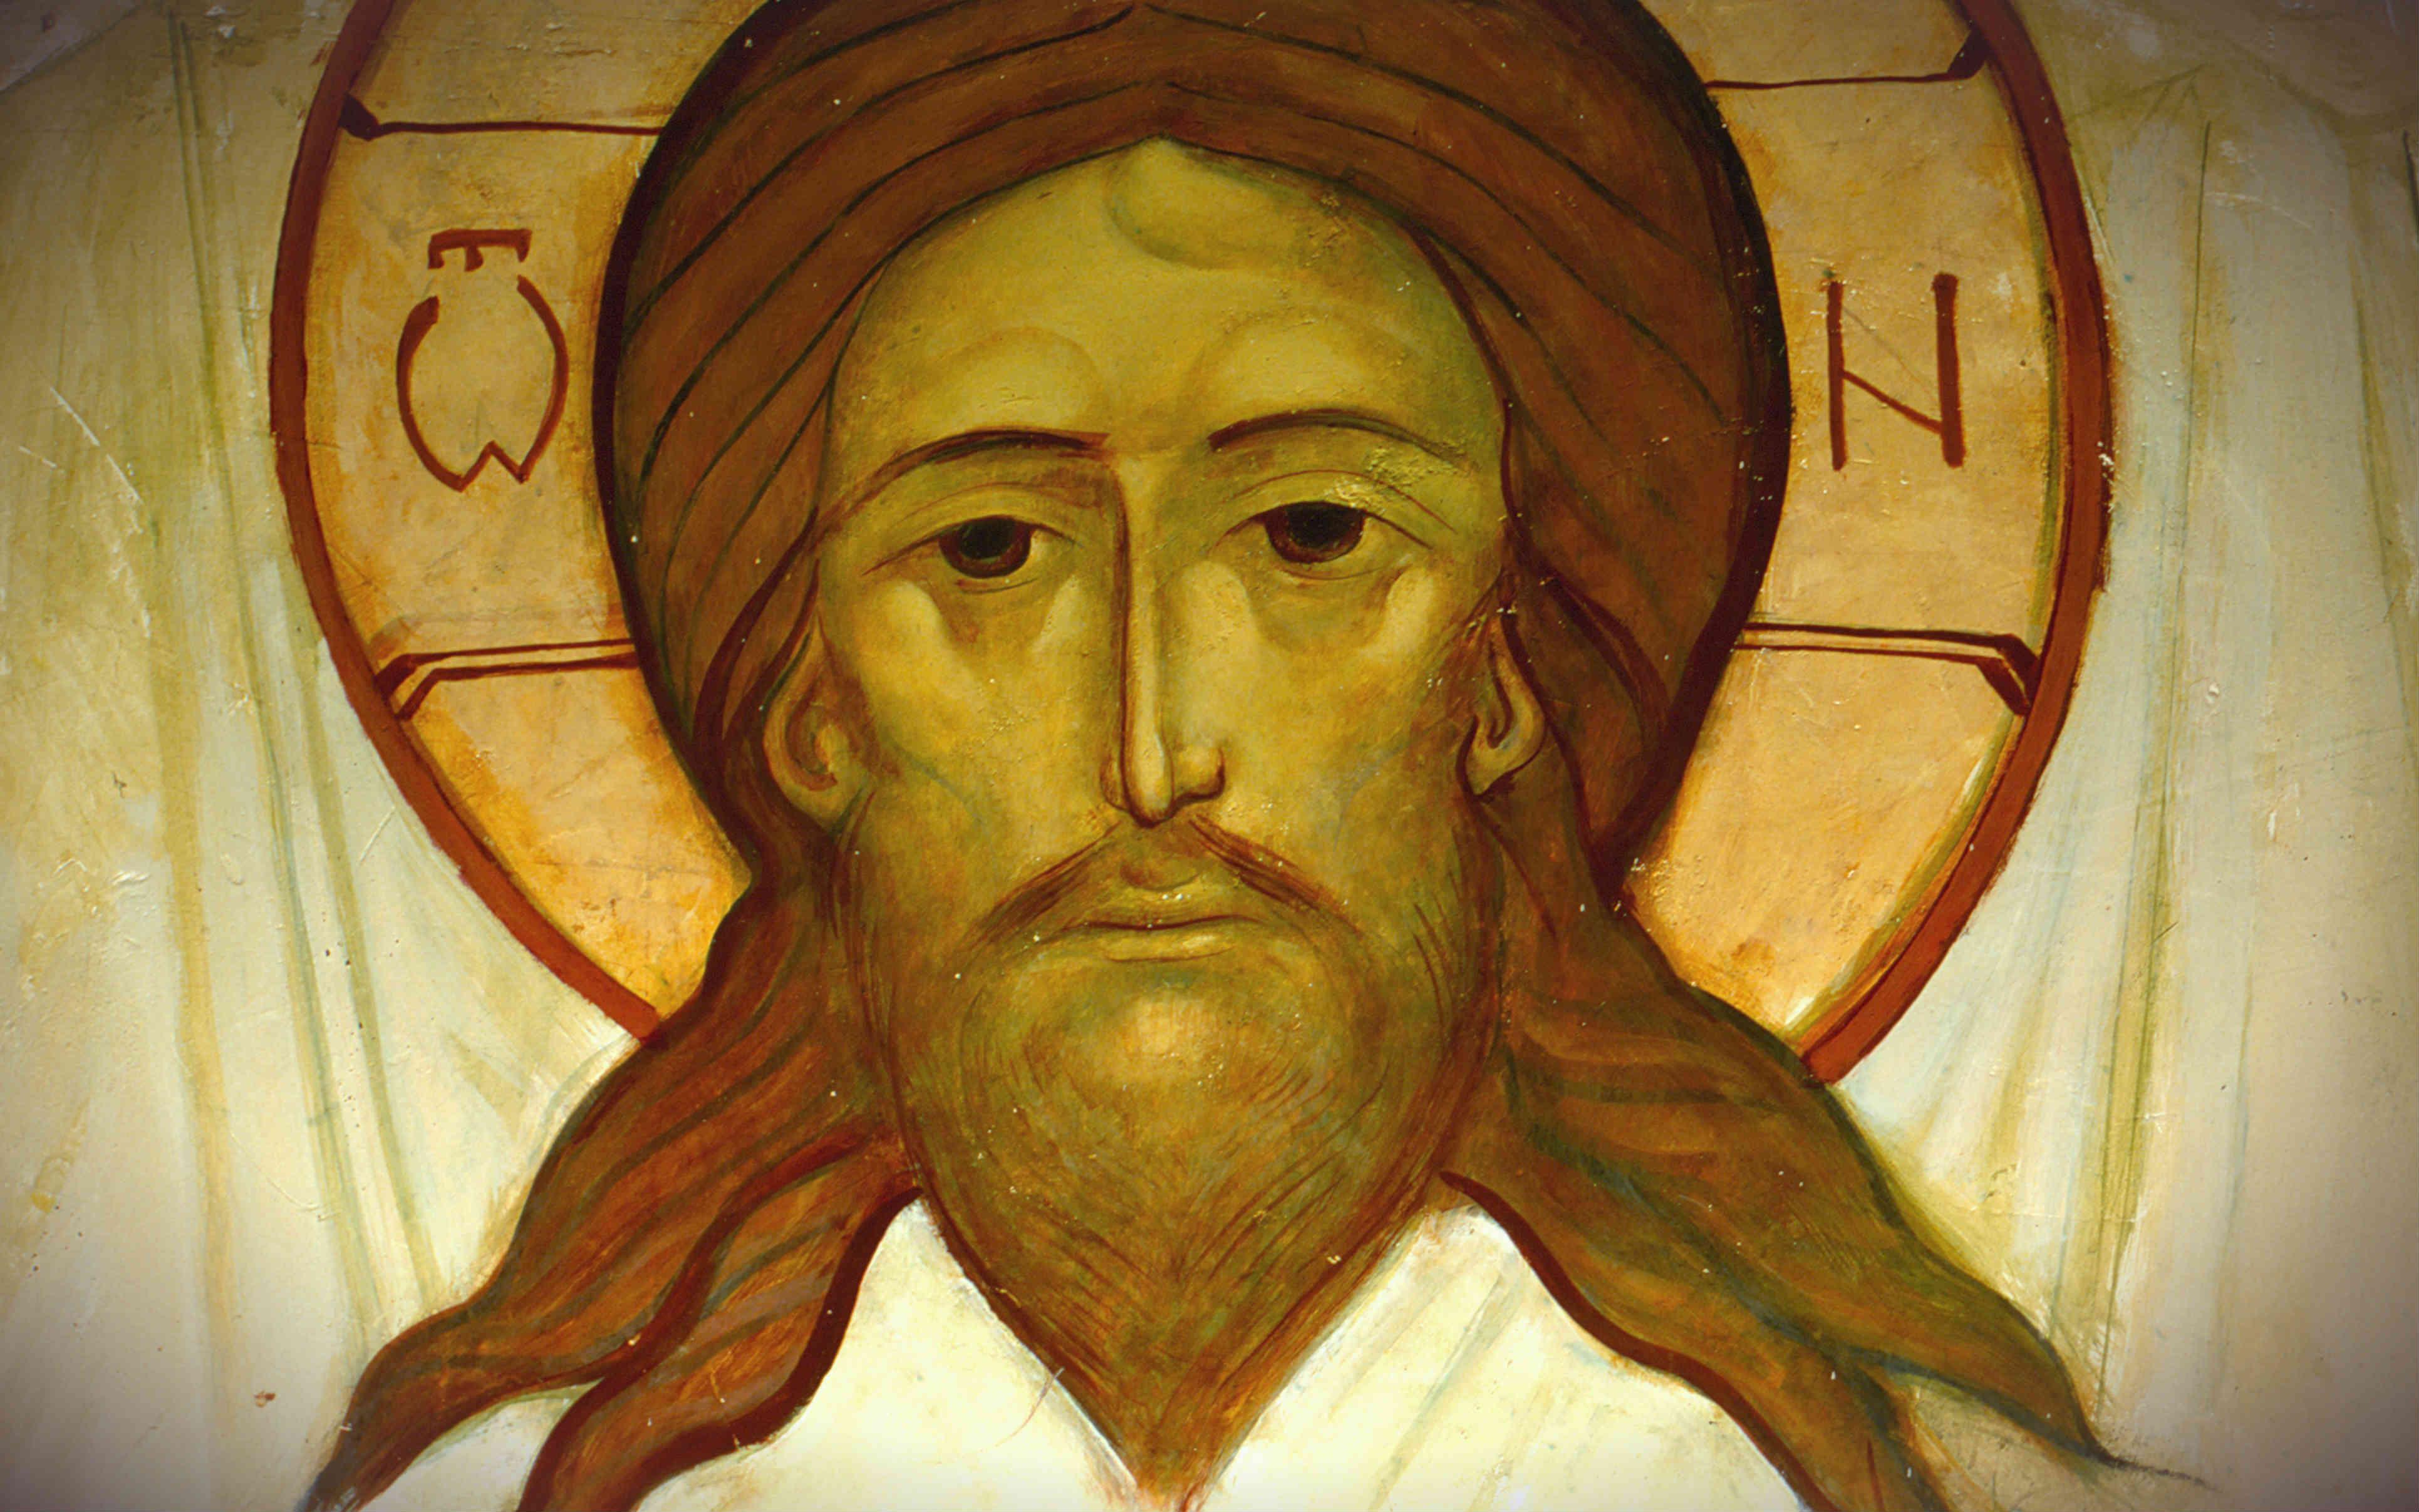 Christian Leadership entails Rigorous Accountability – Augustine